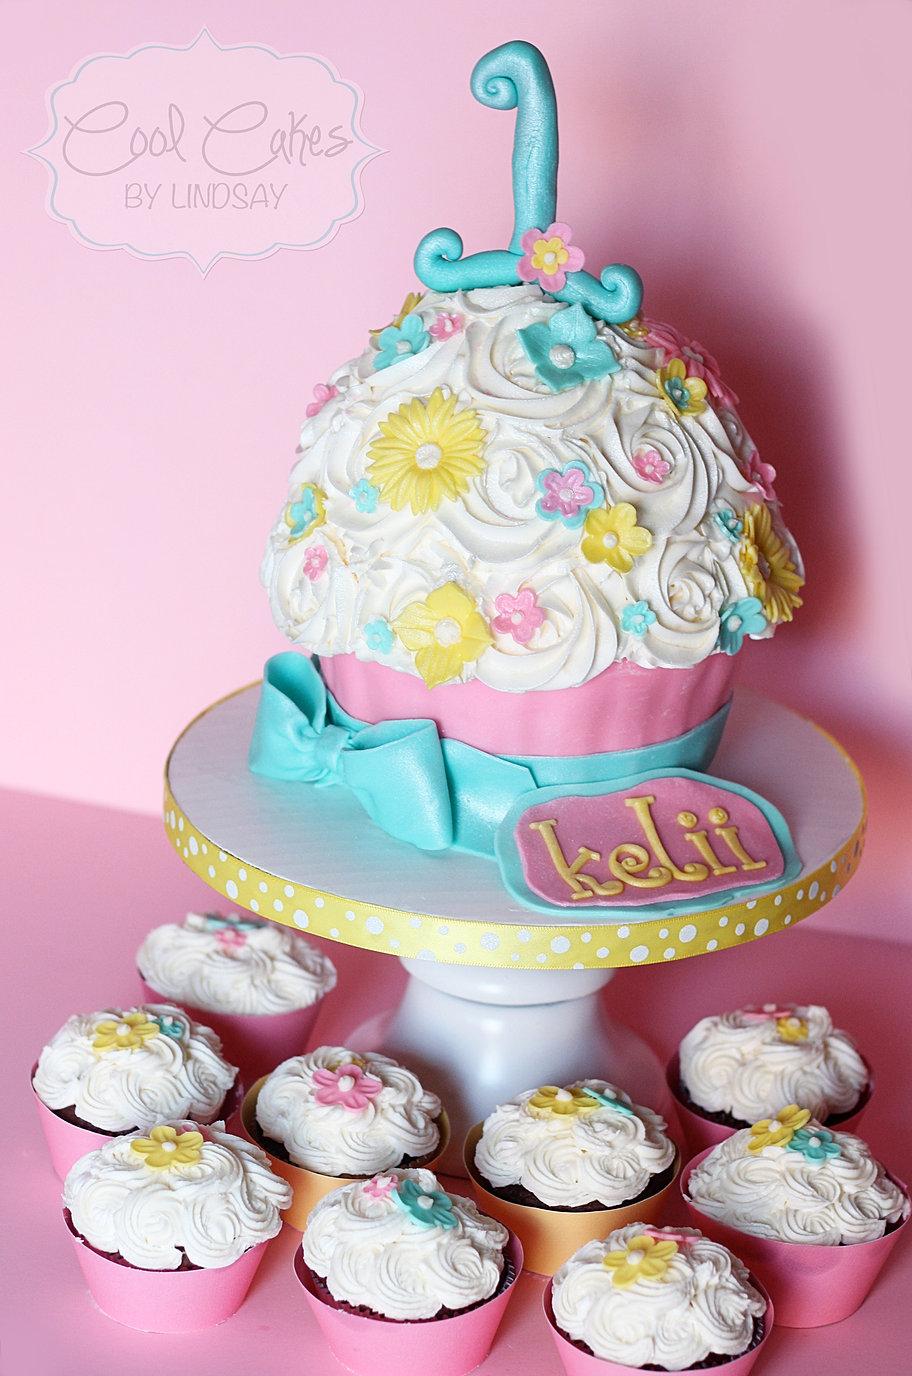 Coolcakesbylindsay